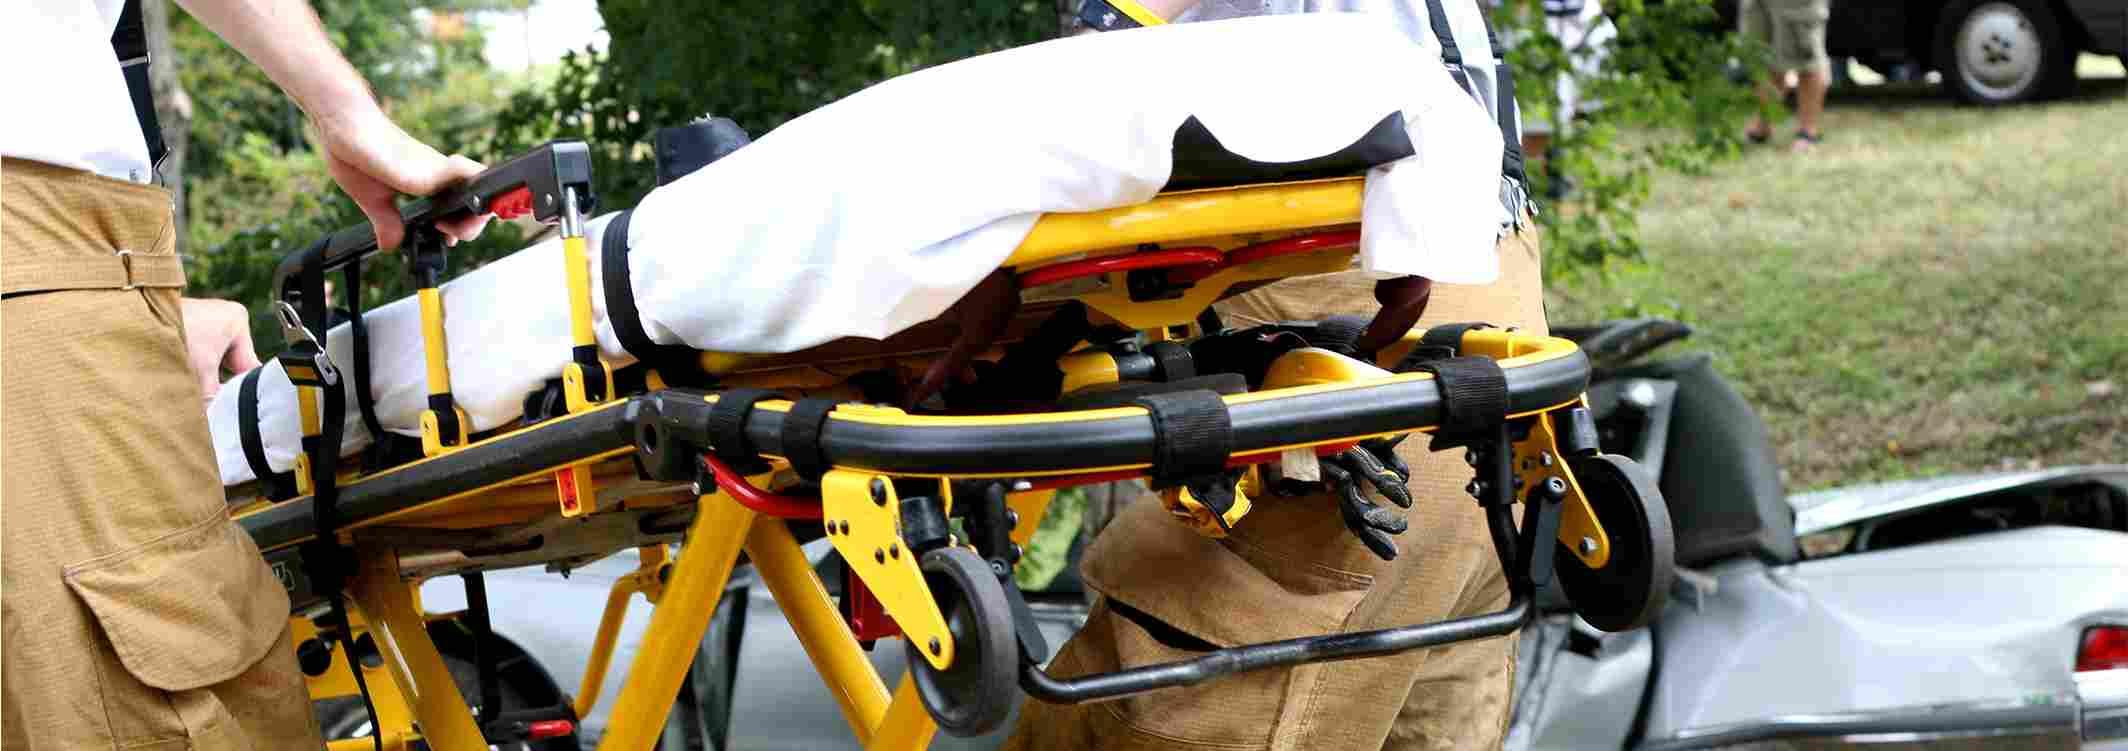 personal-injuries-3